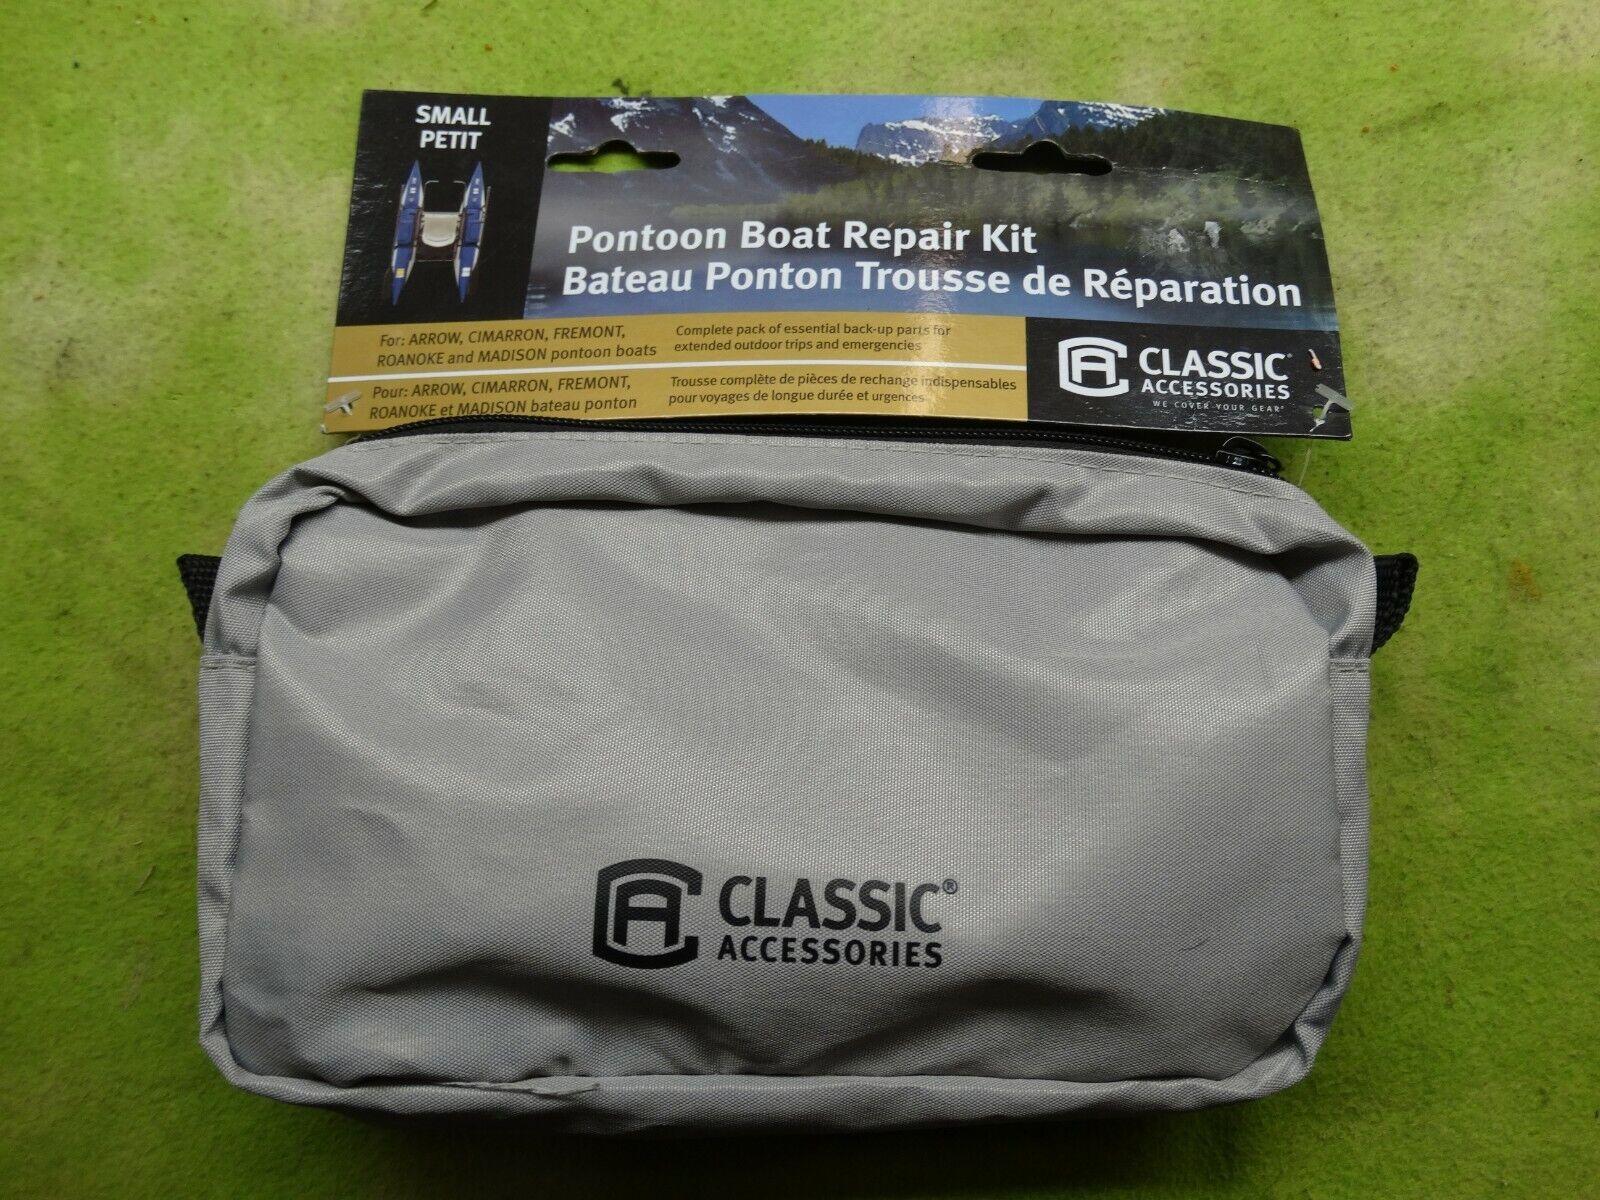 Classic Accessories Small Pontoon Boat Repair Kit - Gray